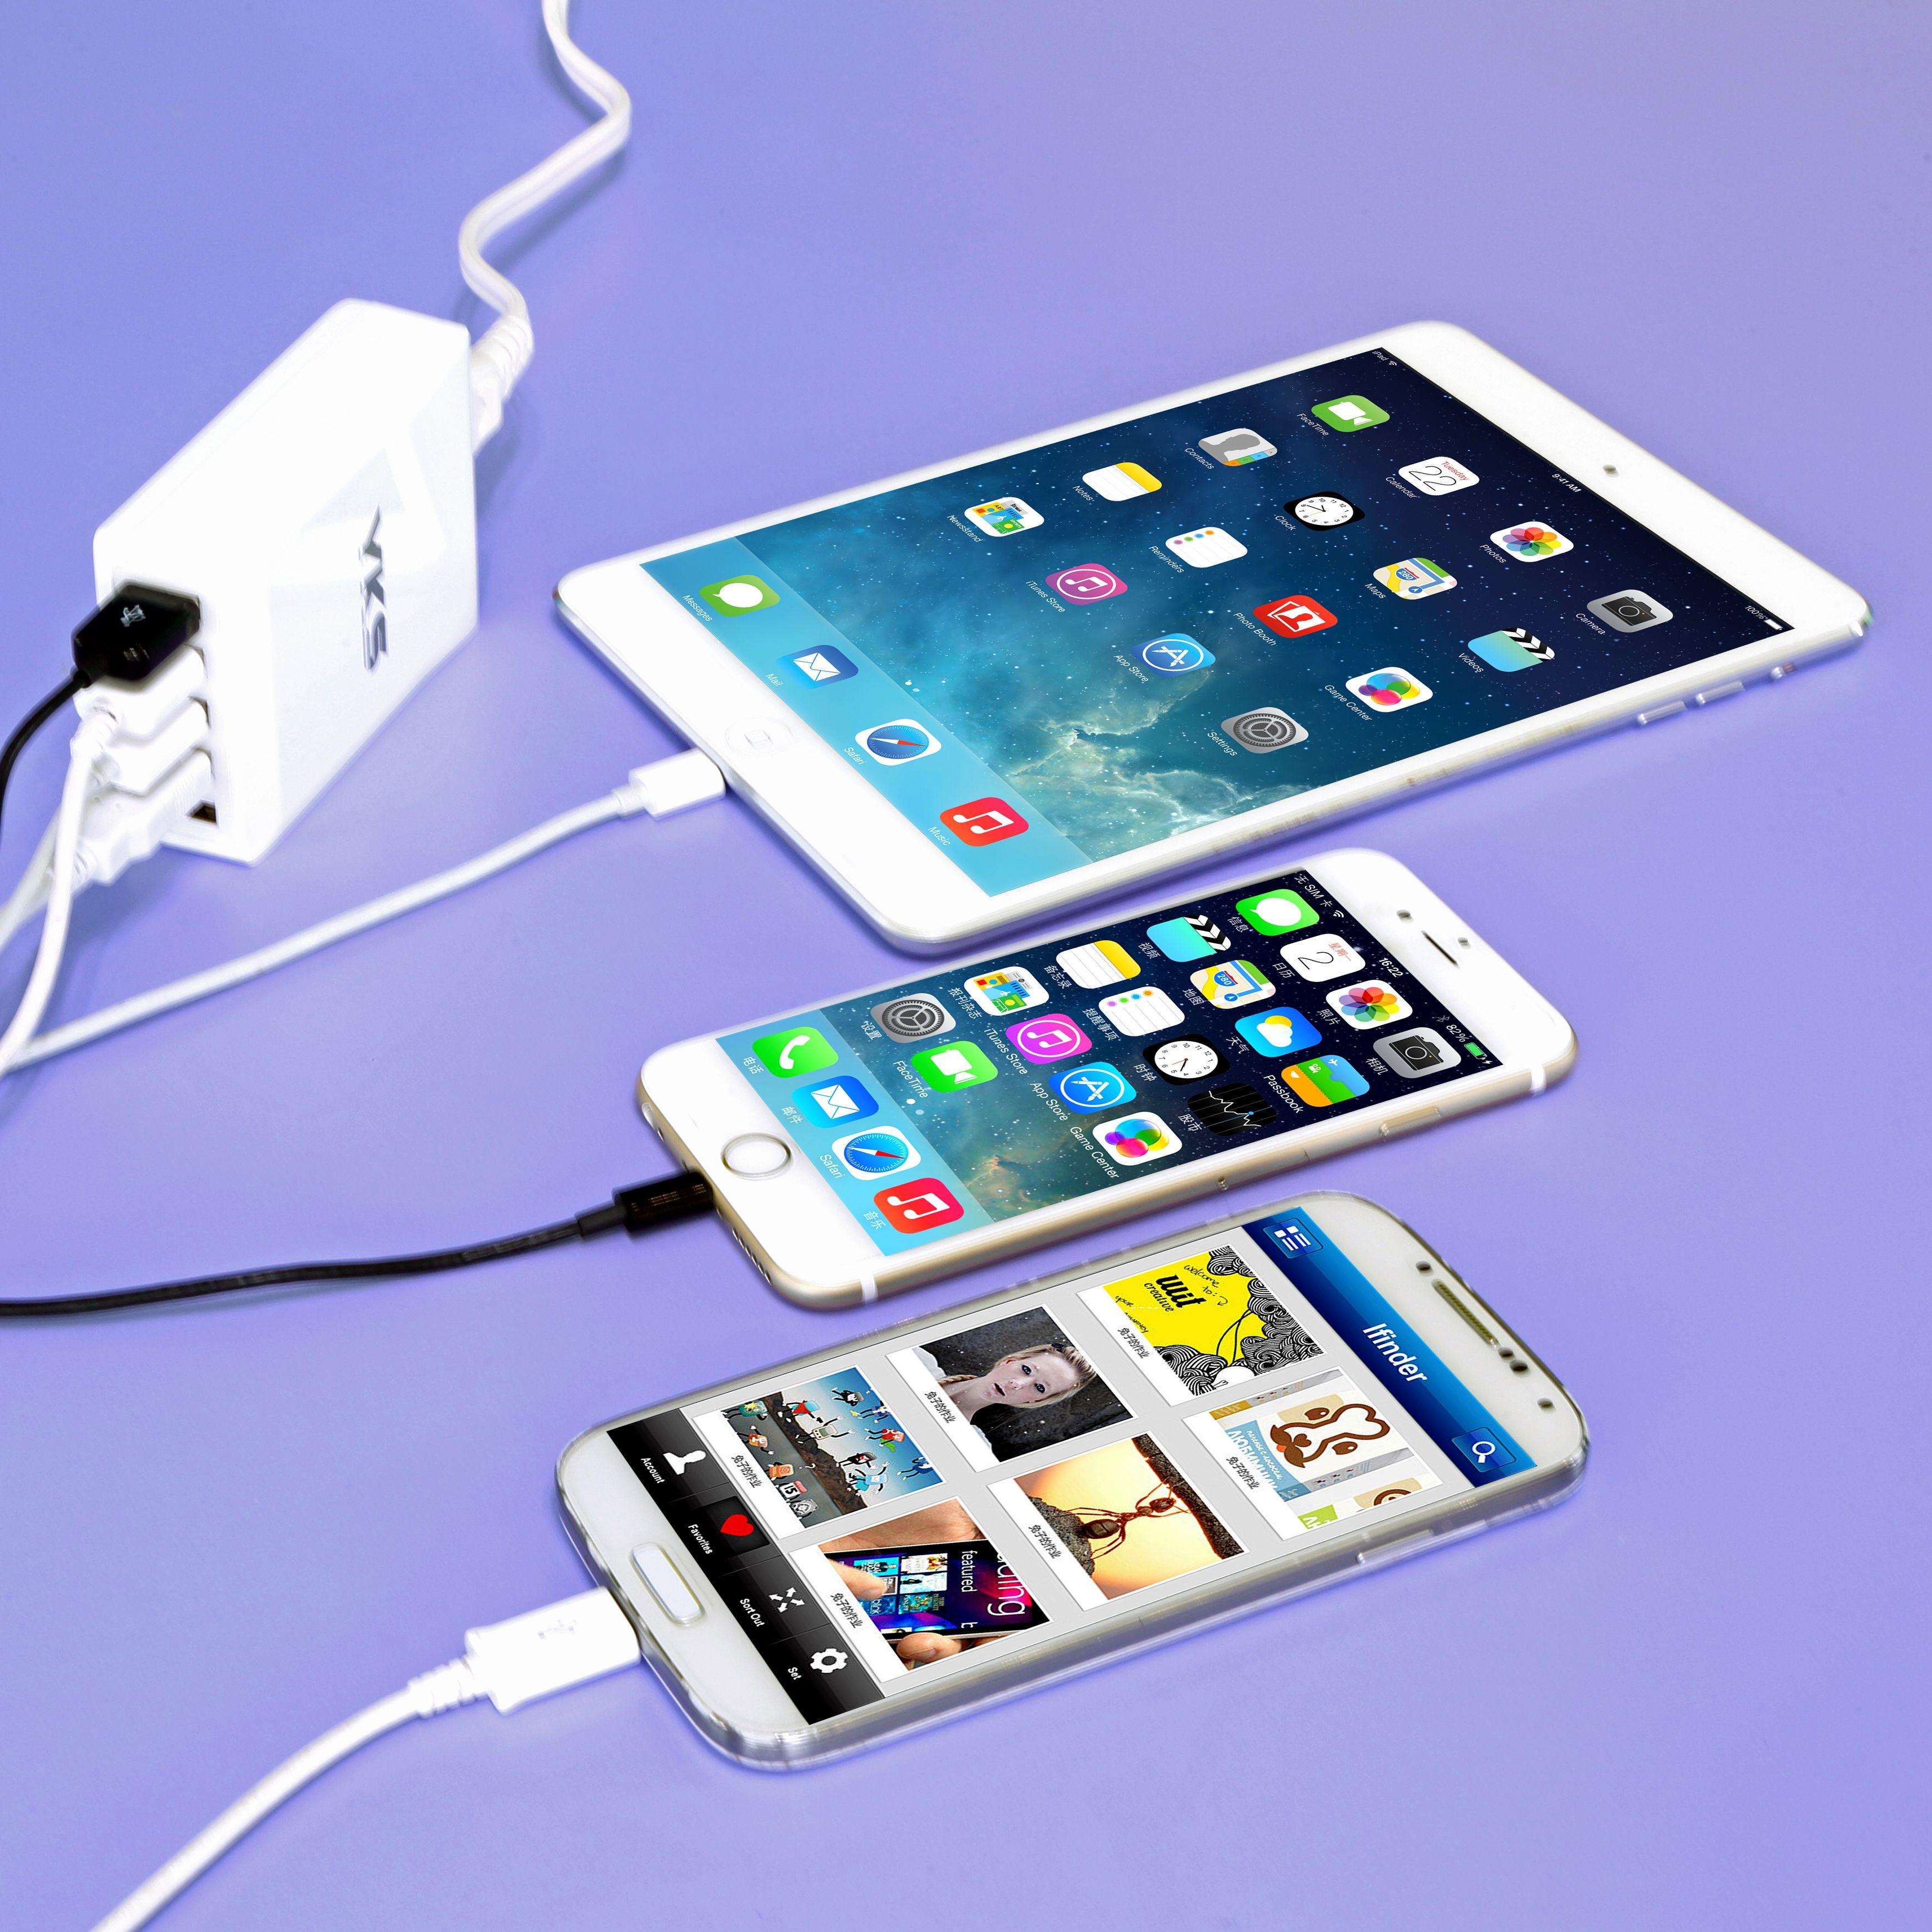 http://www.amazon.com/YKS-Family-Sized-Desktop-Technology-Smartphones/dp/B00PBYLIEM/ref=sr_1_1?ie=UTF8&qid=1415928157&sr=8-1&keywords=yks+40w